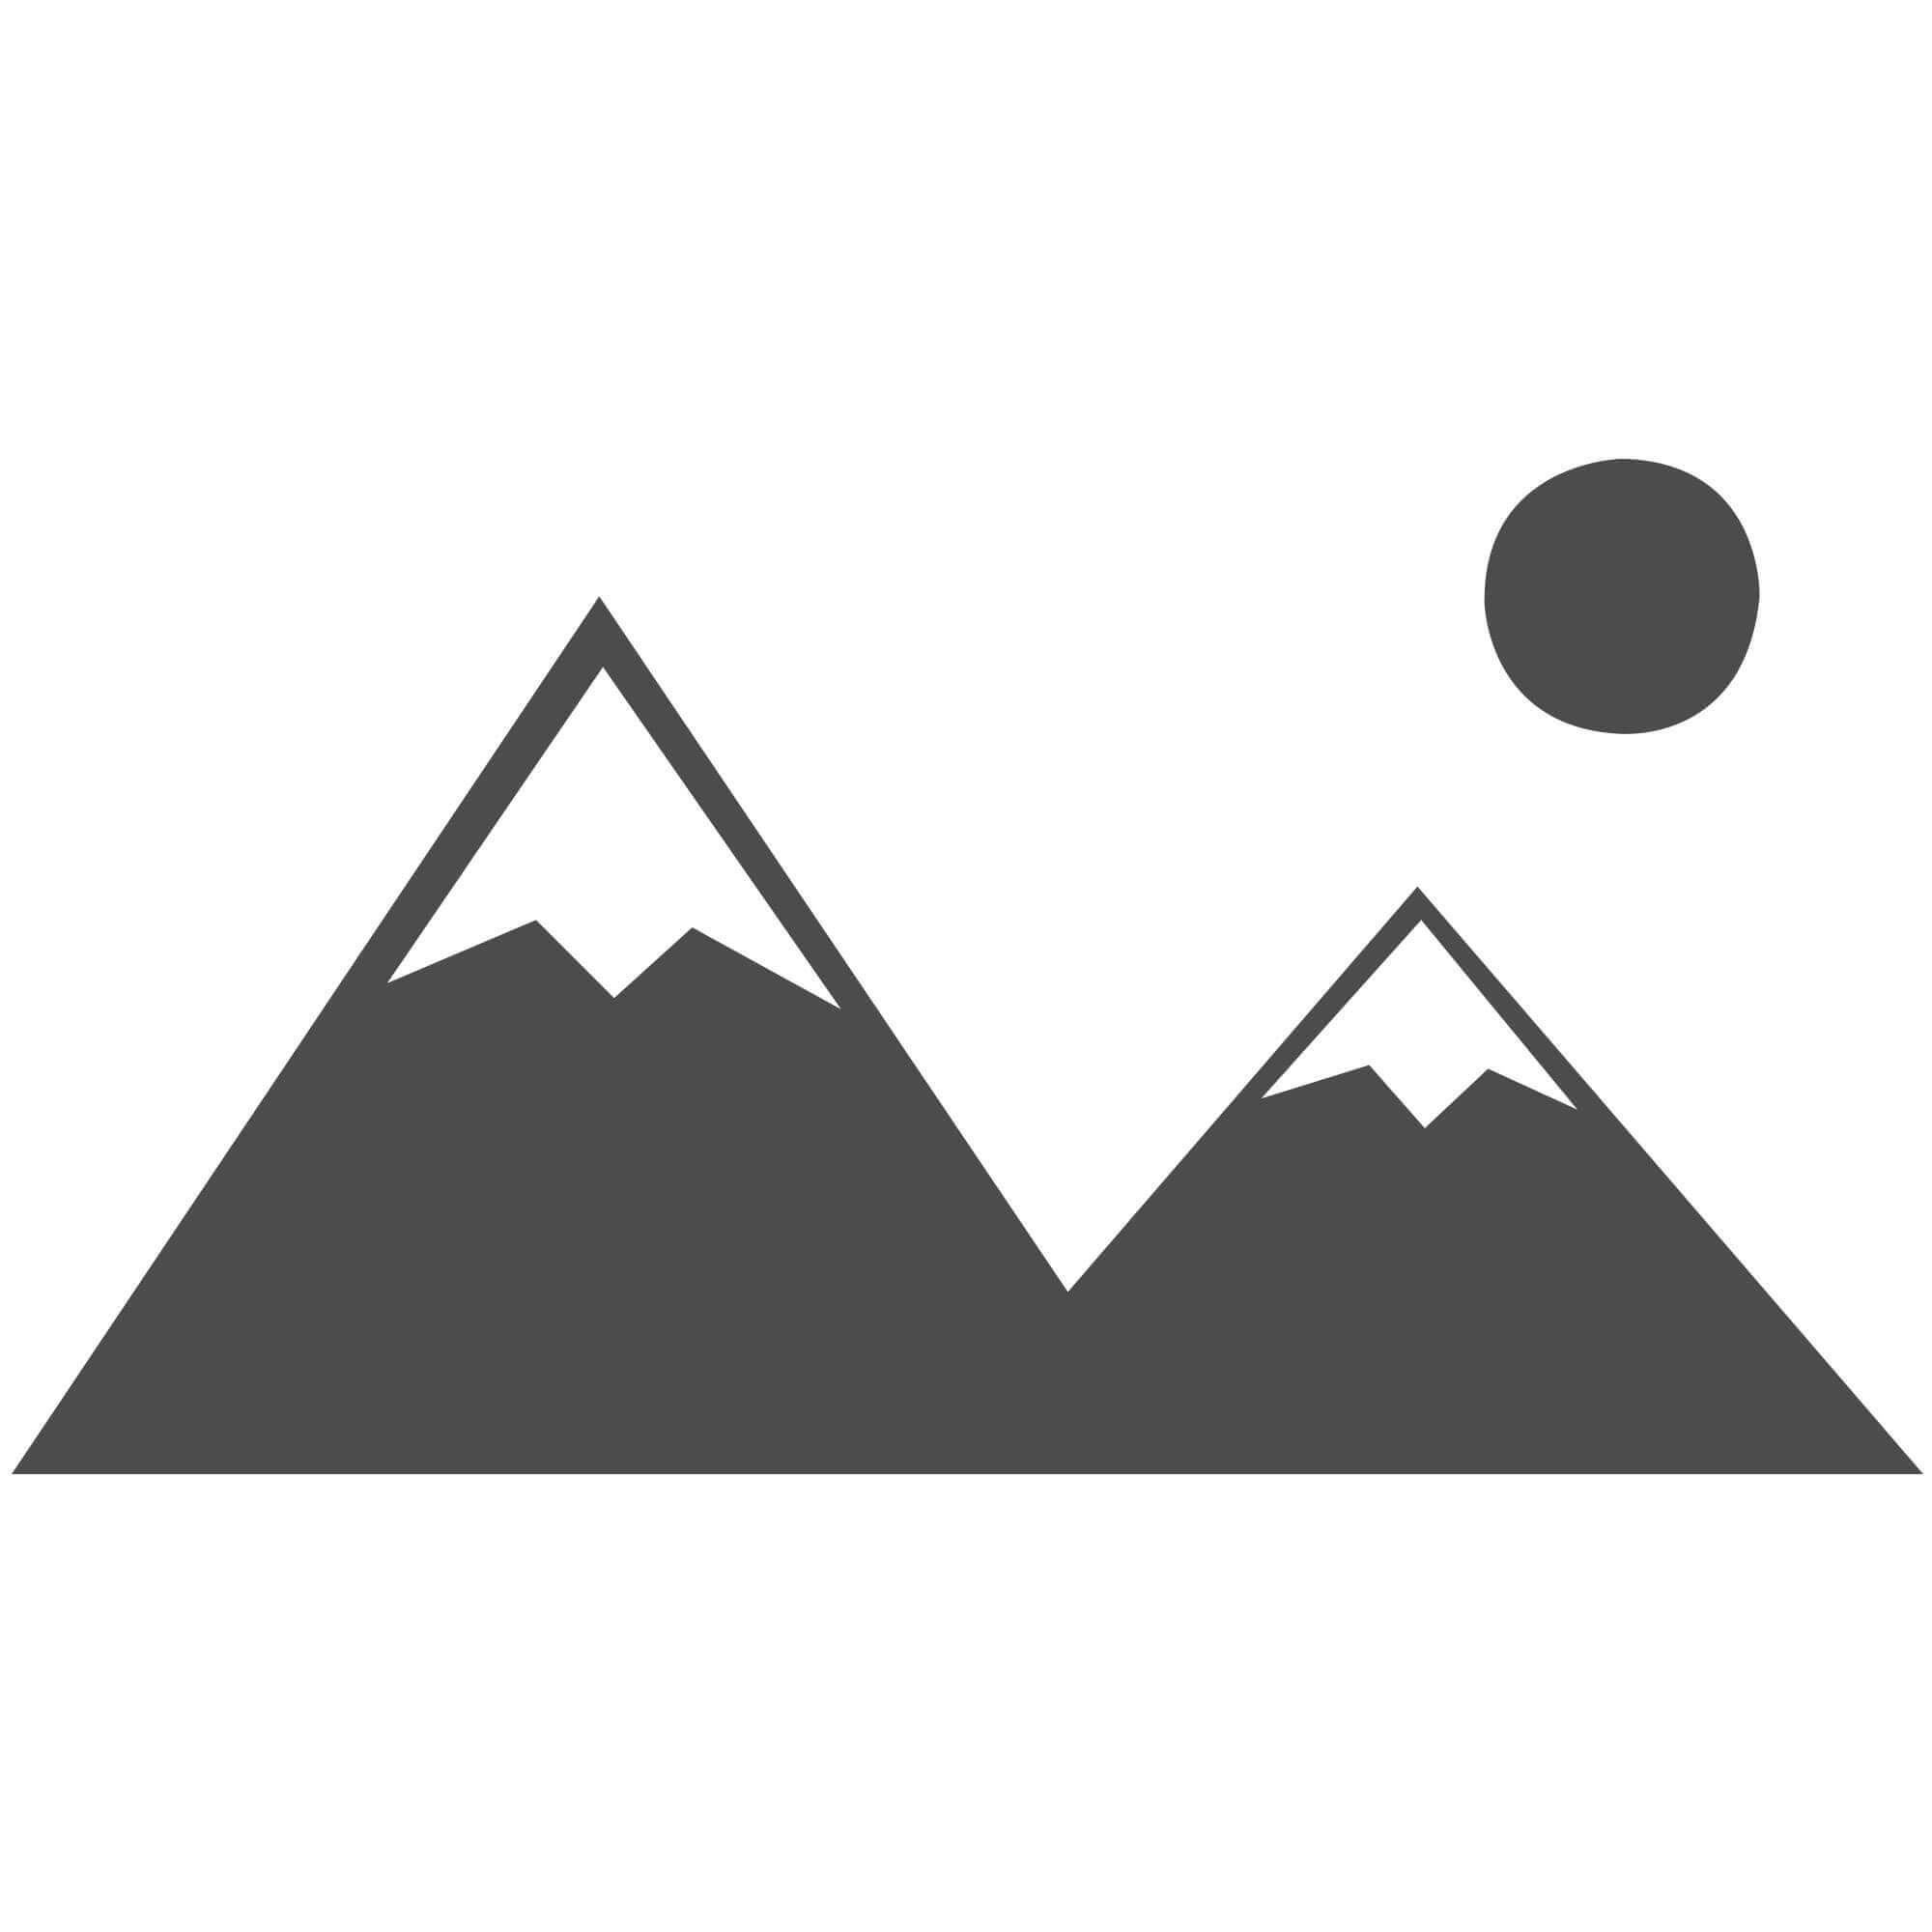 "Sloan Flatweave Rug - Blue - Size 160 x 230 cm (5'3"" x 7'7"")"